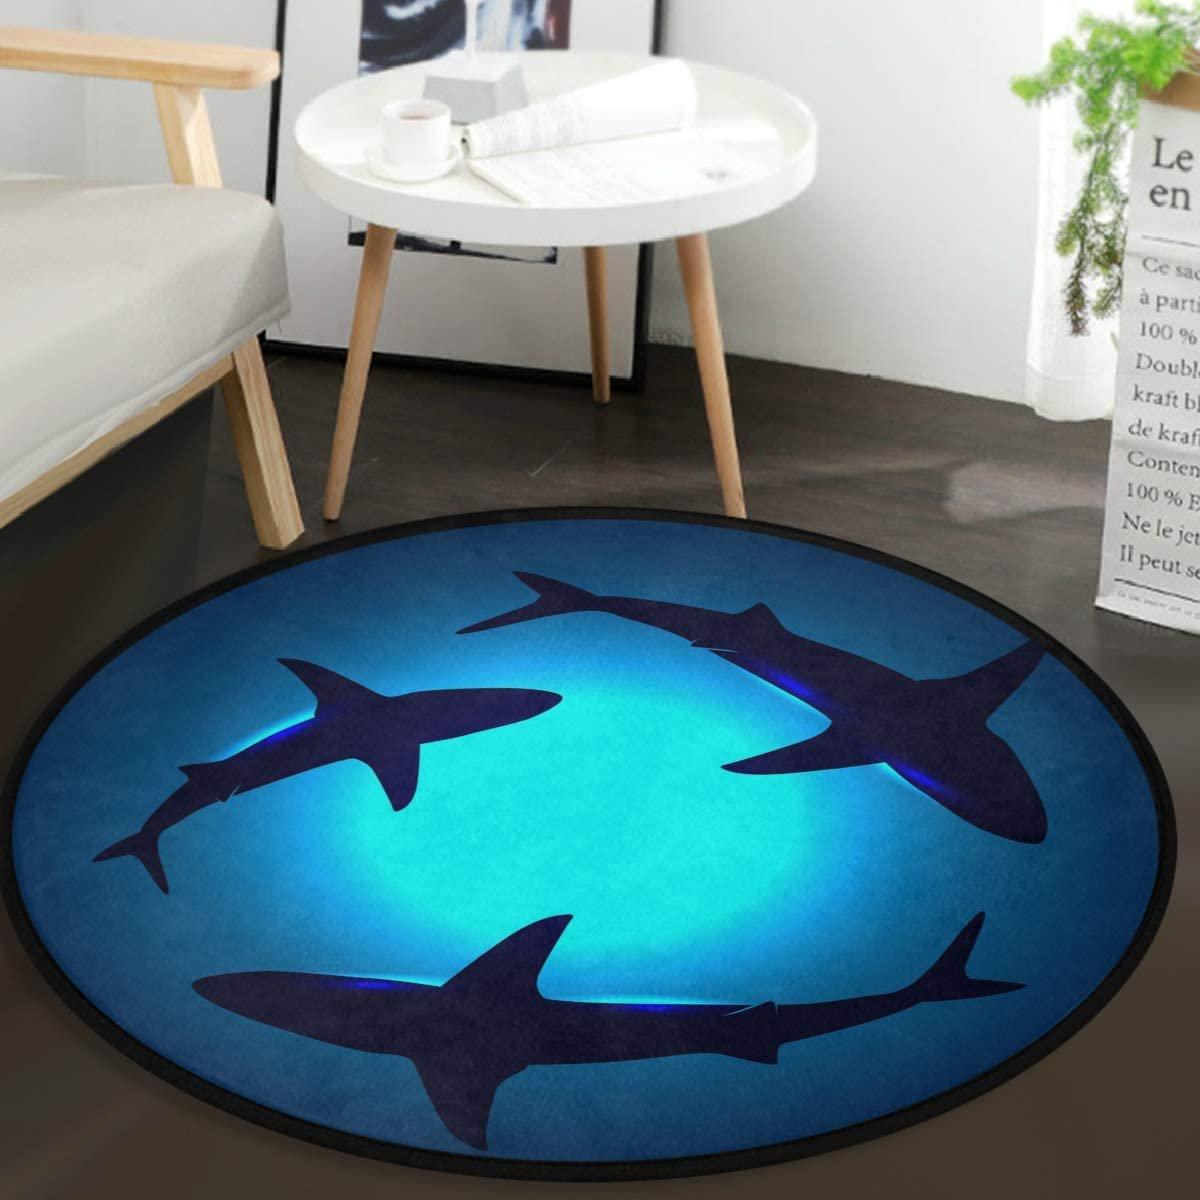 Cute Ocean Animal Sharks Round Doormat Shark Blue Ocean Water Non Slip Absorbent Round Rug Floor Carpet Yoga Mat For Entryway Bedroom Living Room Sofa Home Decor Walmart Canada